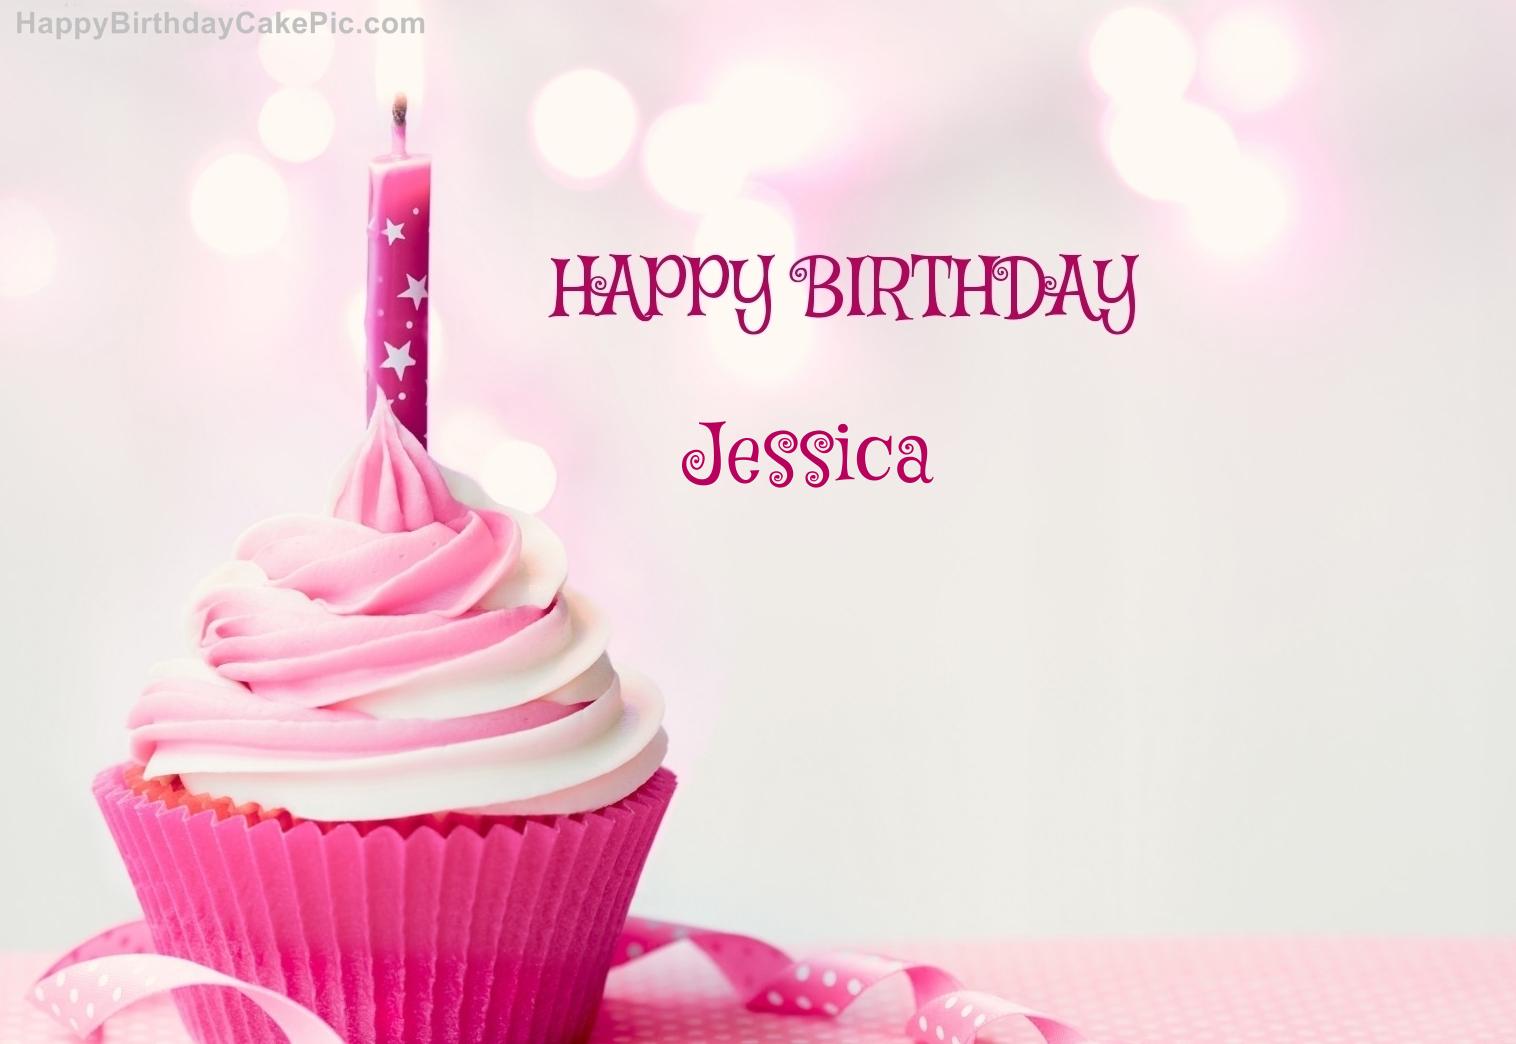 Jessica Birthday Cake